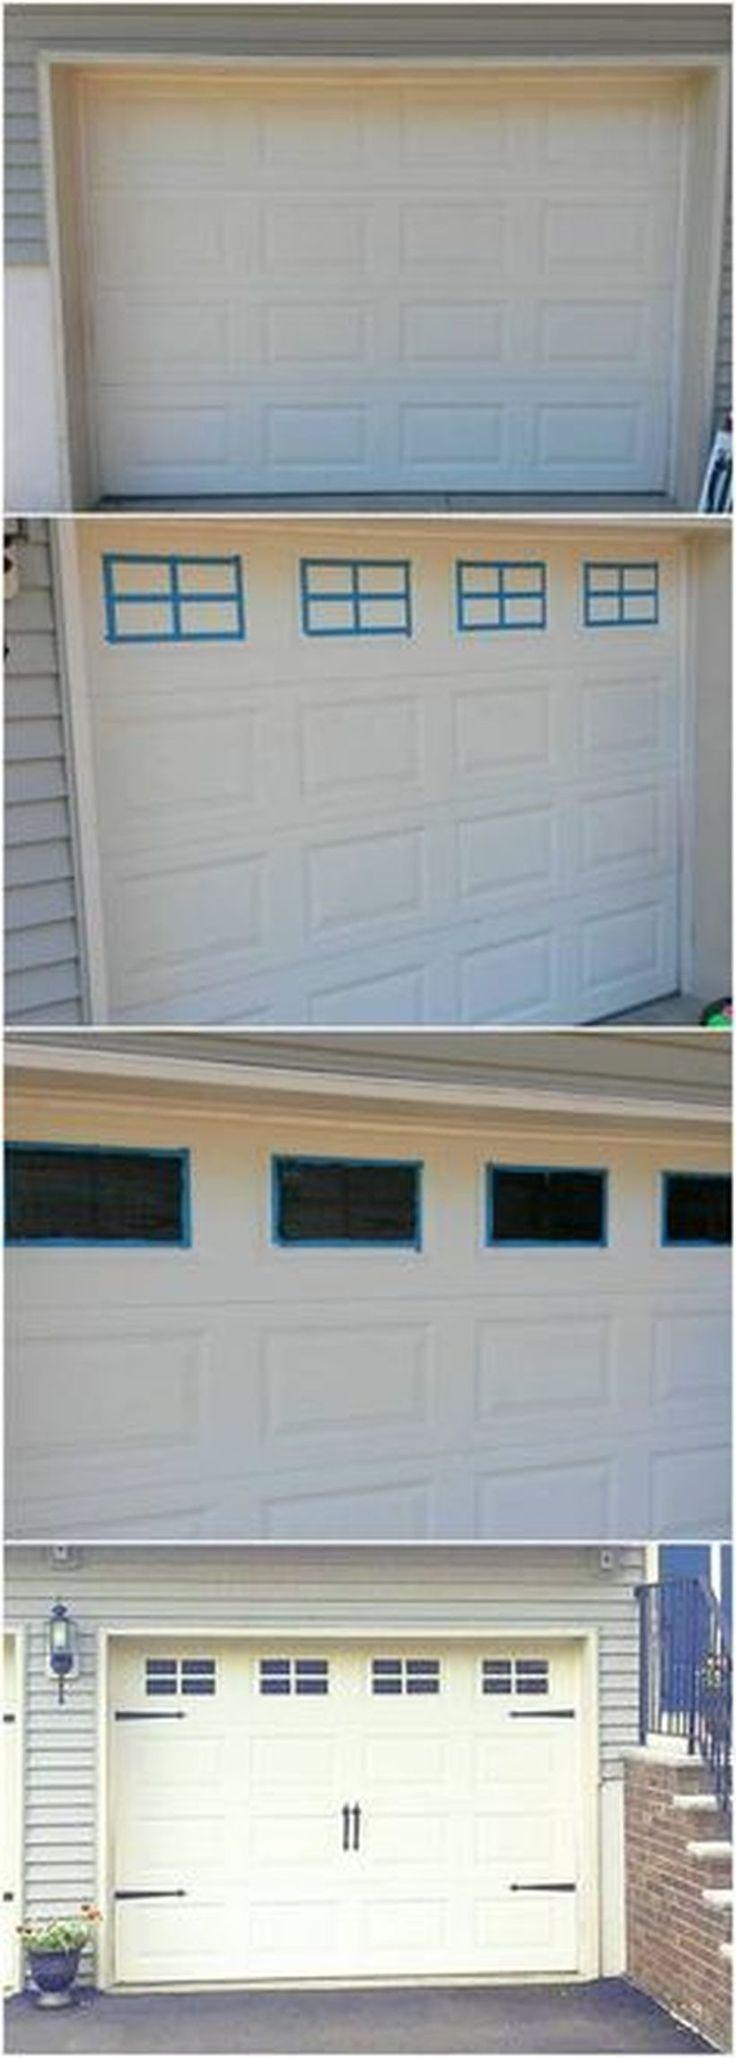 Best 25 garage door supply ideas on pinterest used garage doors 170 awesome home garage doors design ideas that you must see rubansaba